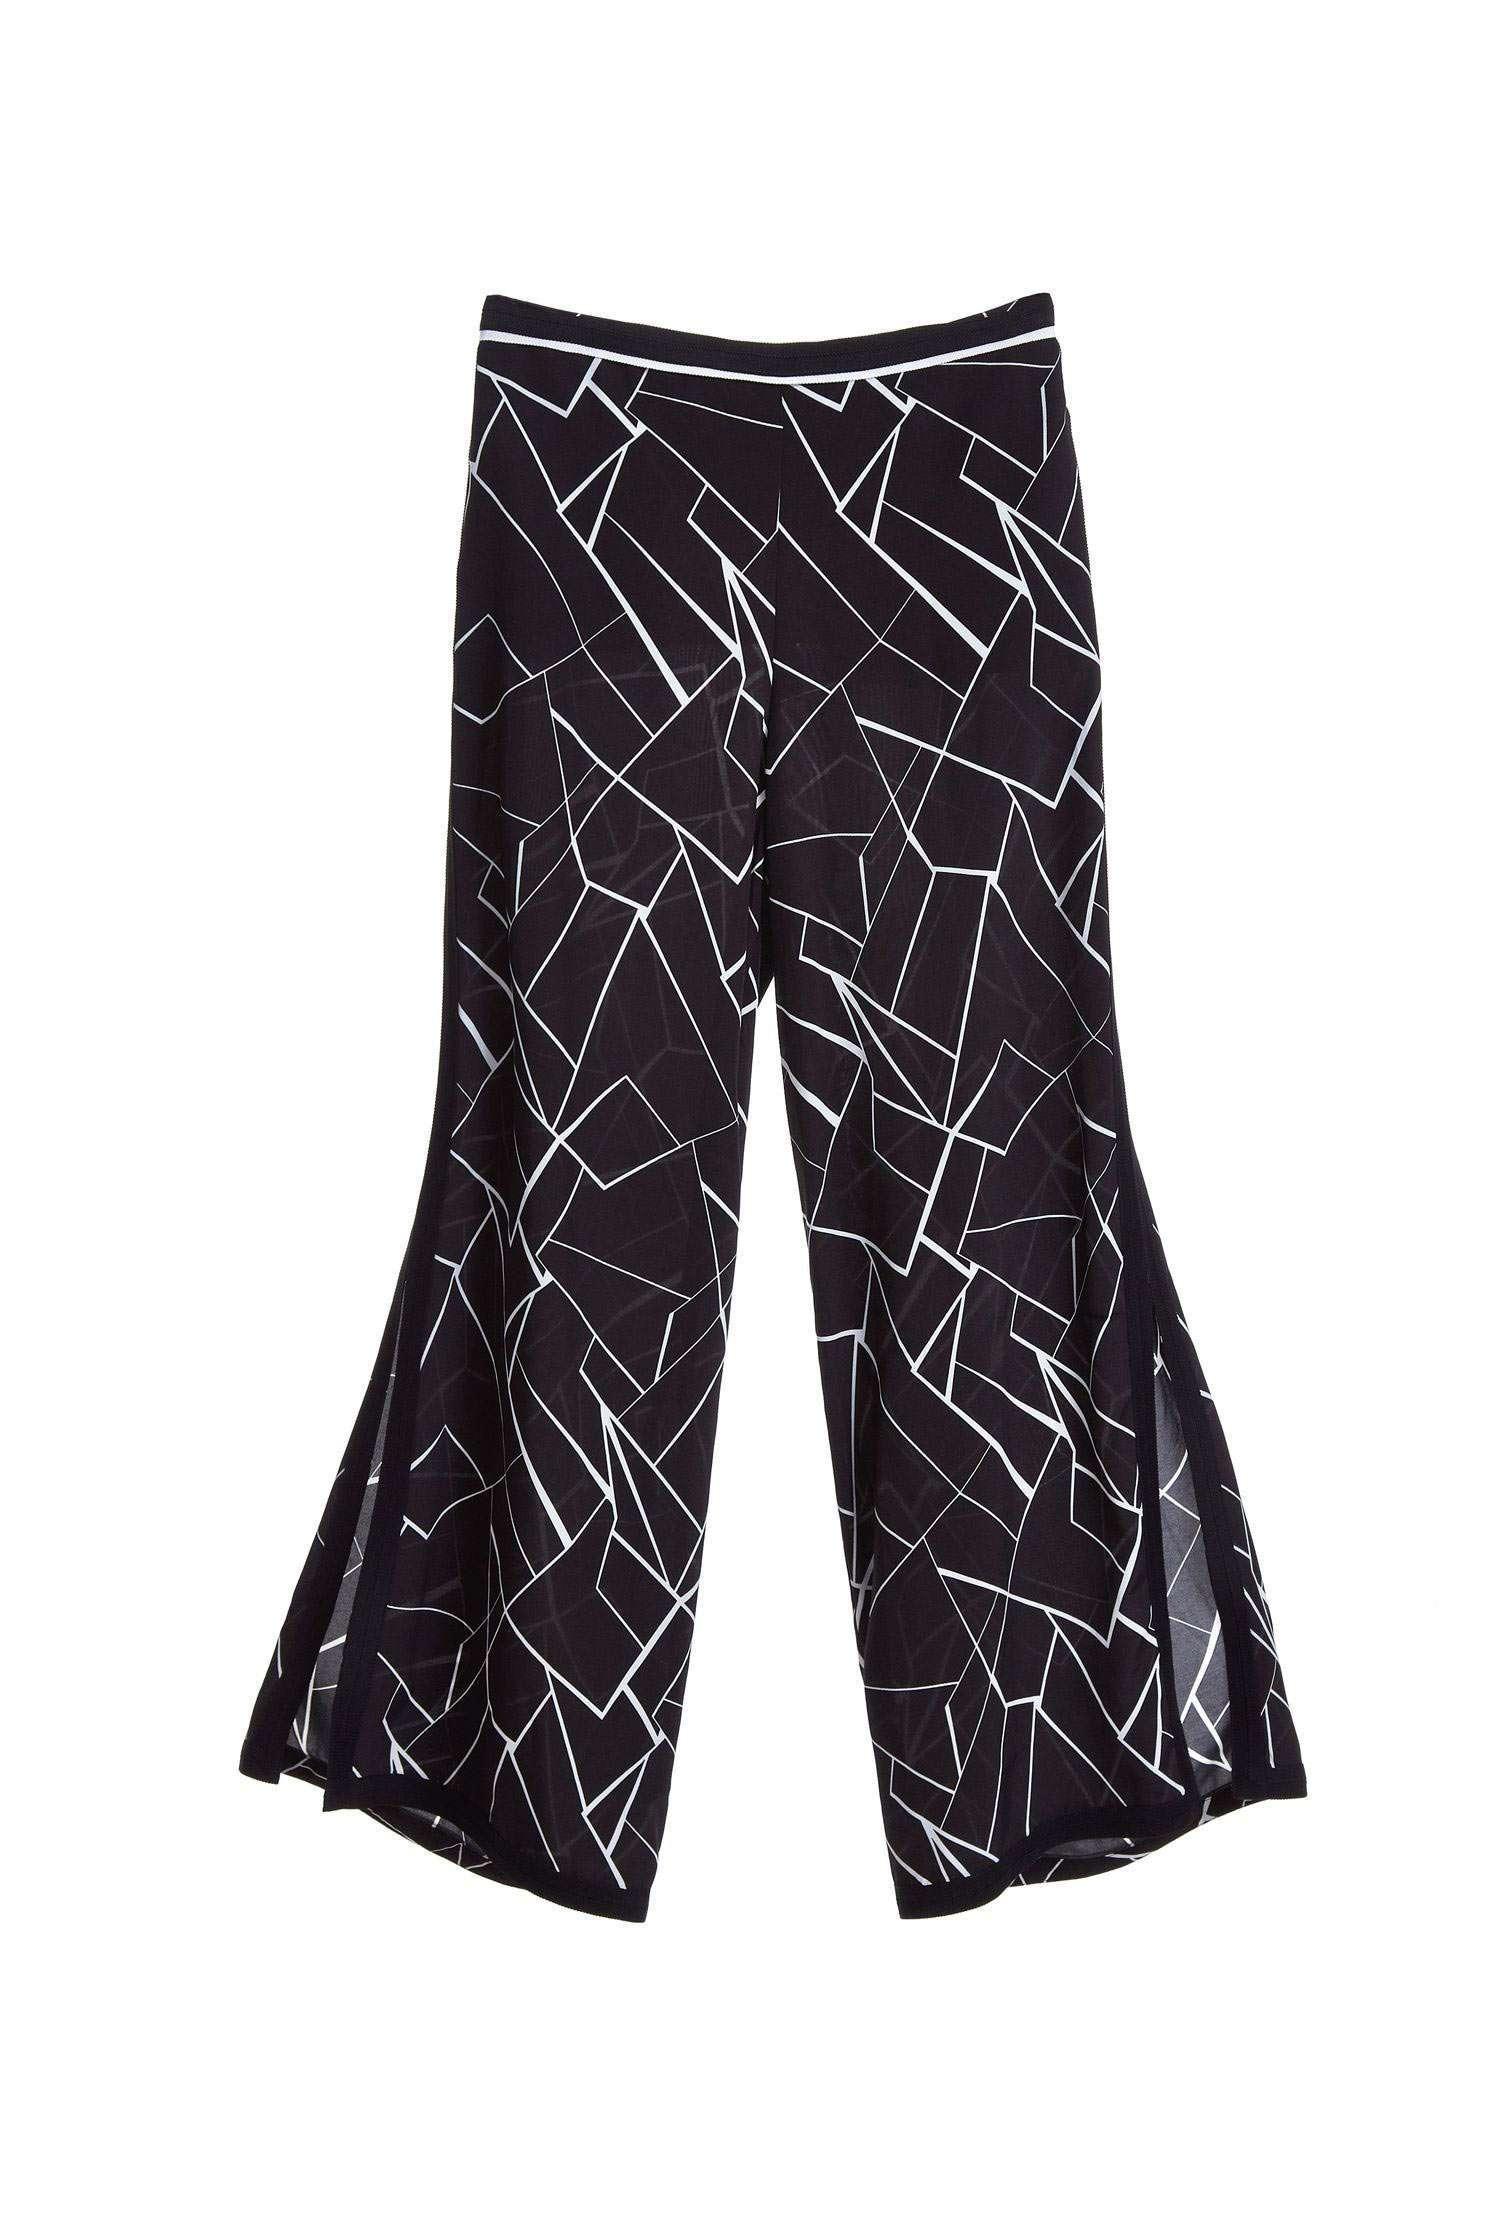 Elegant split long pants